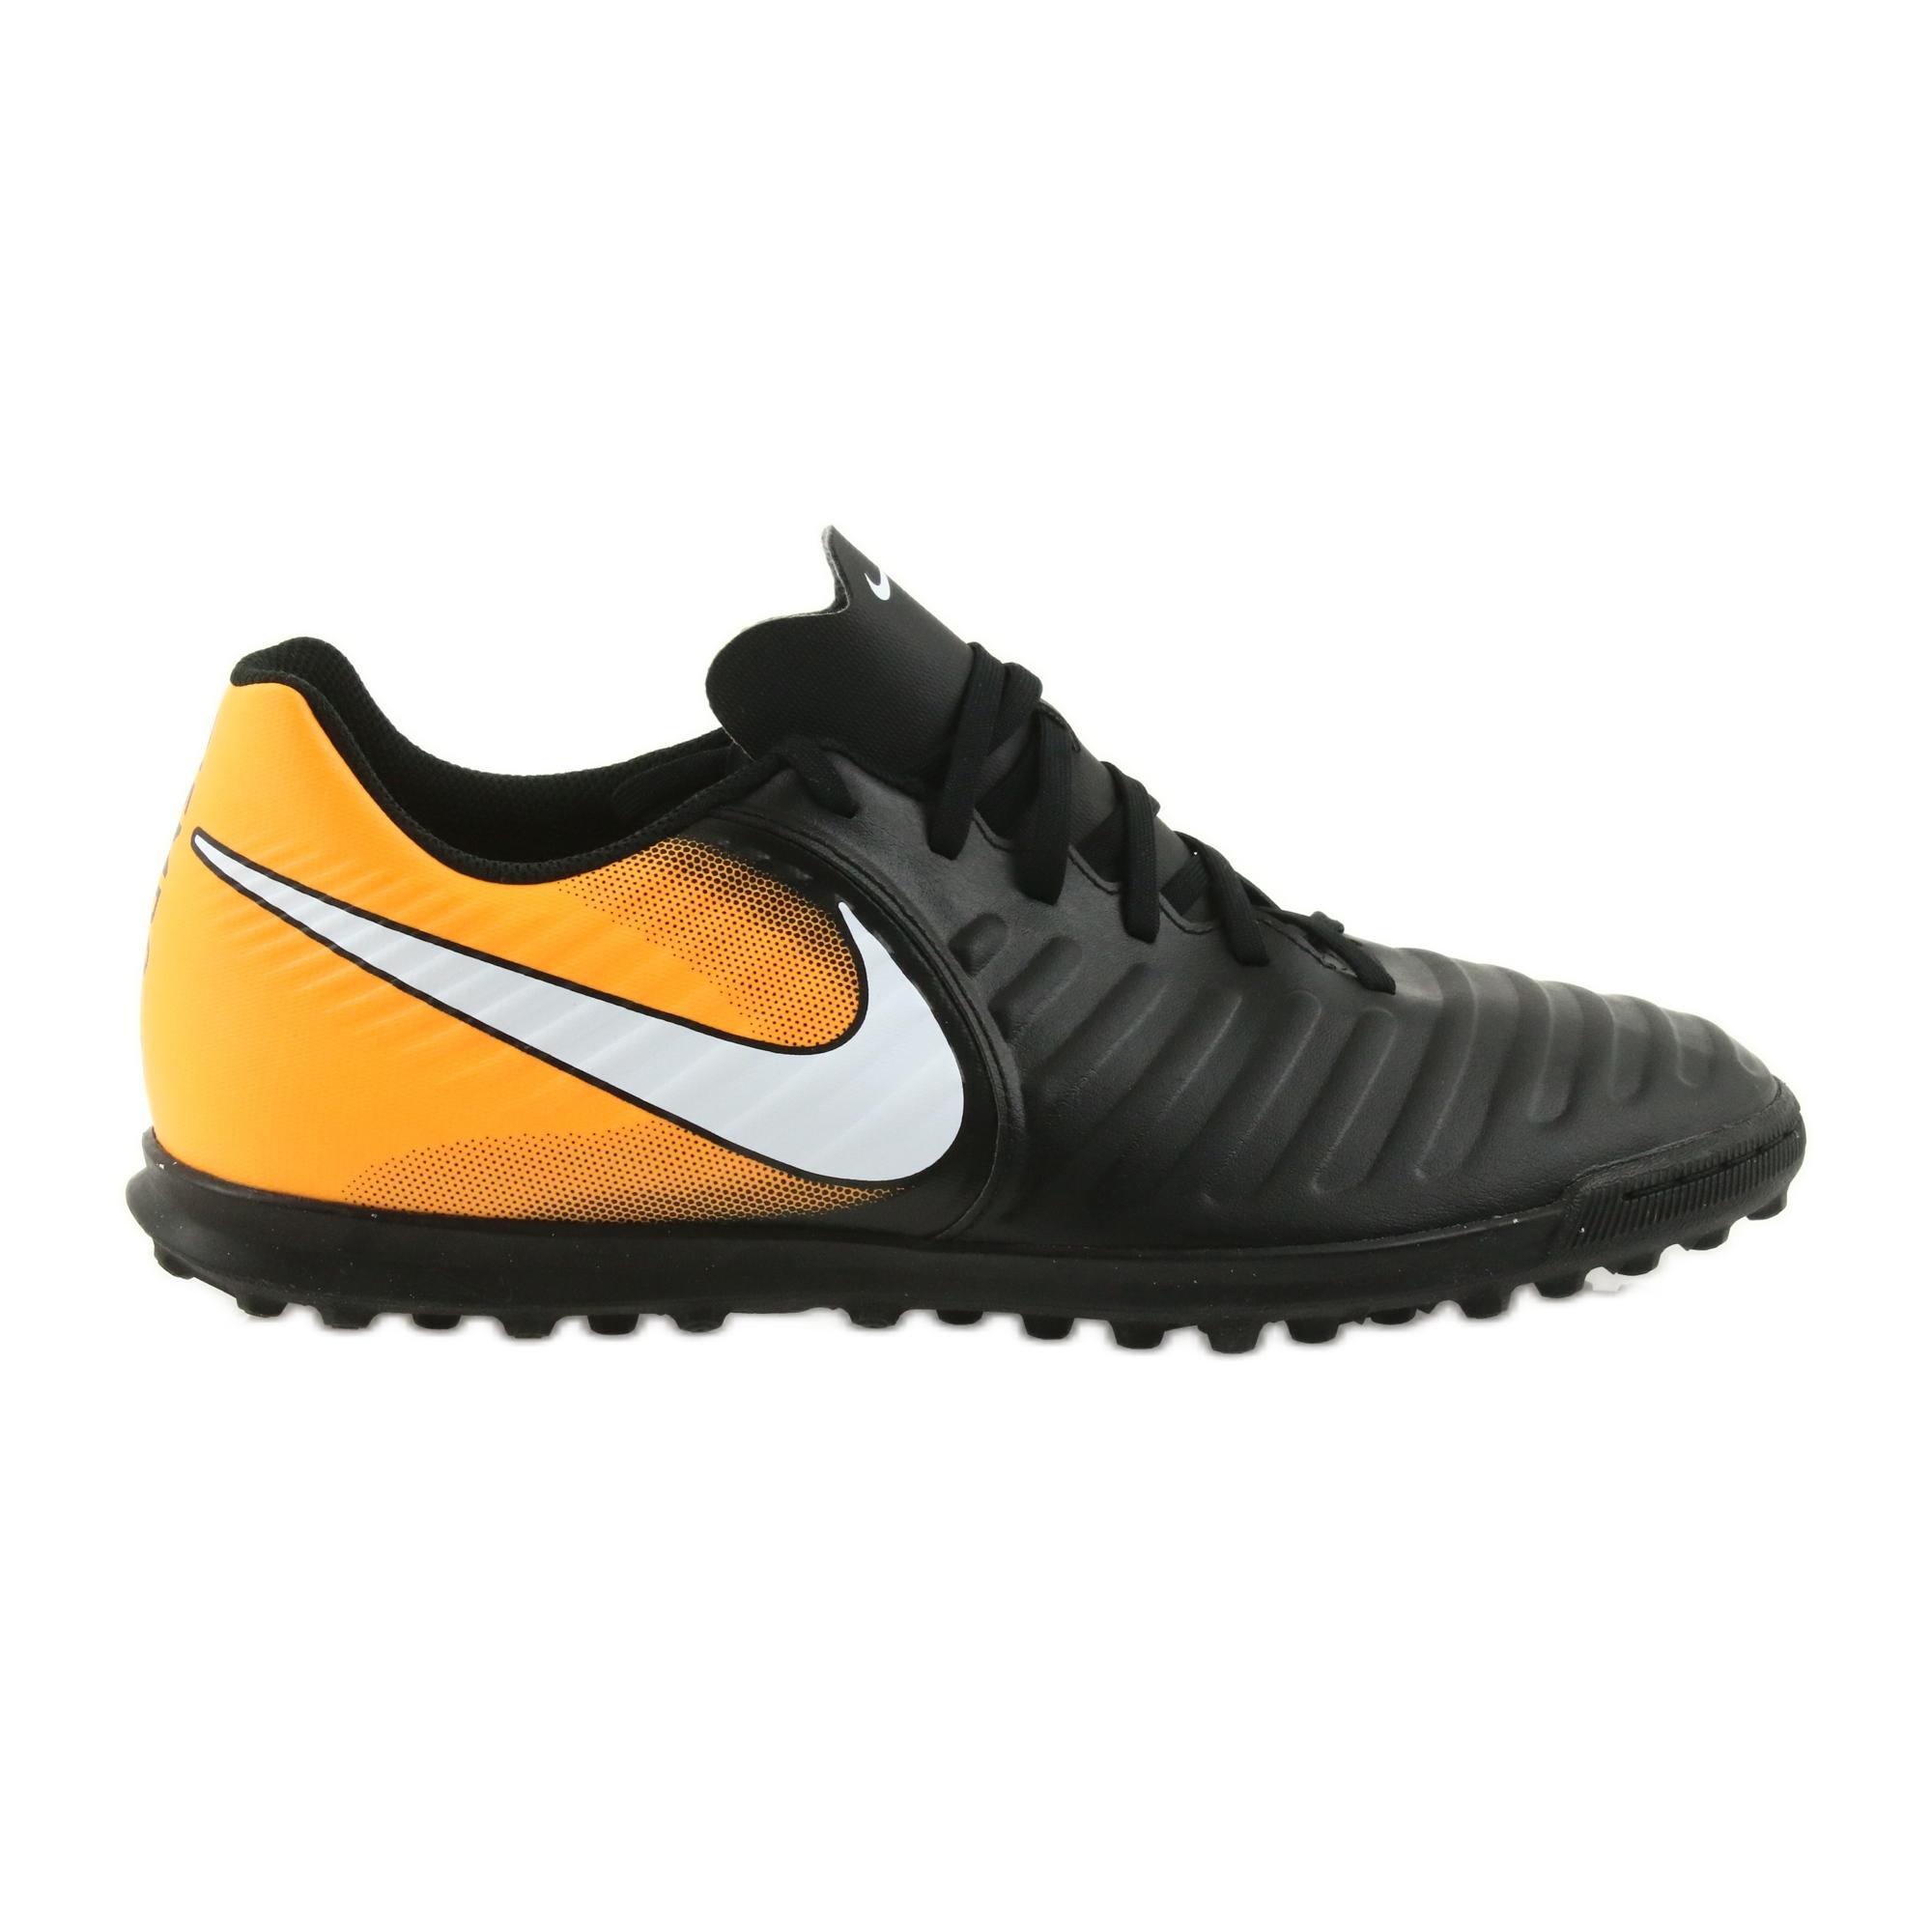 Football De Rio Nike Chaussures Iv Tiempox Tf SzUVMp